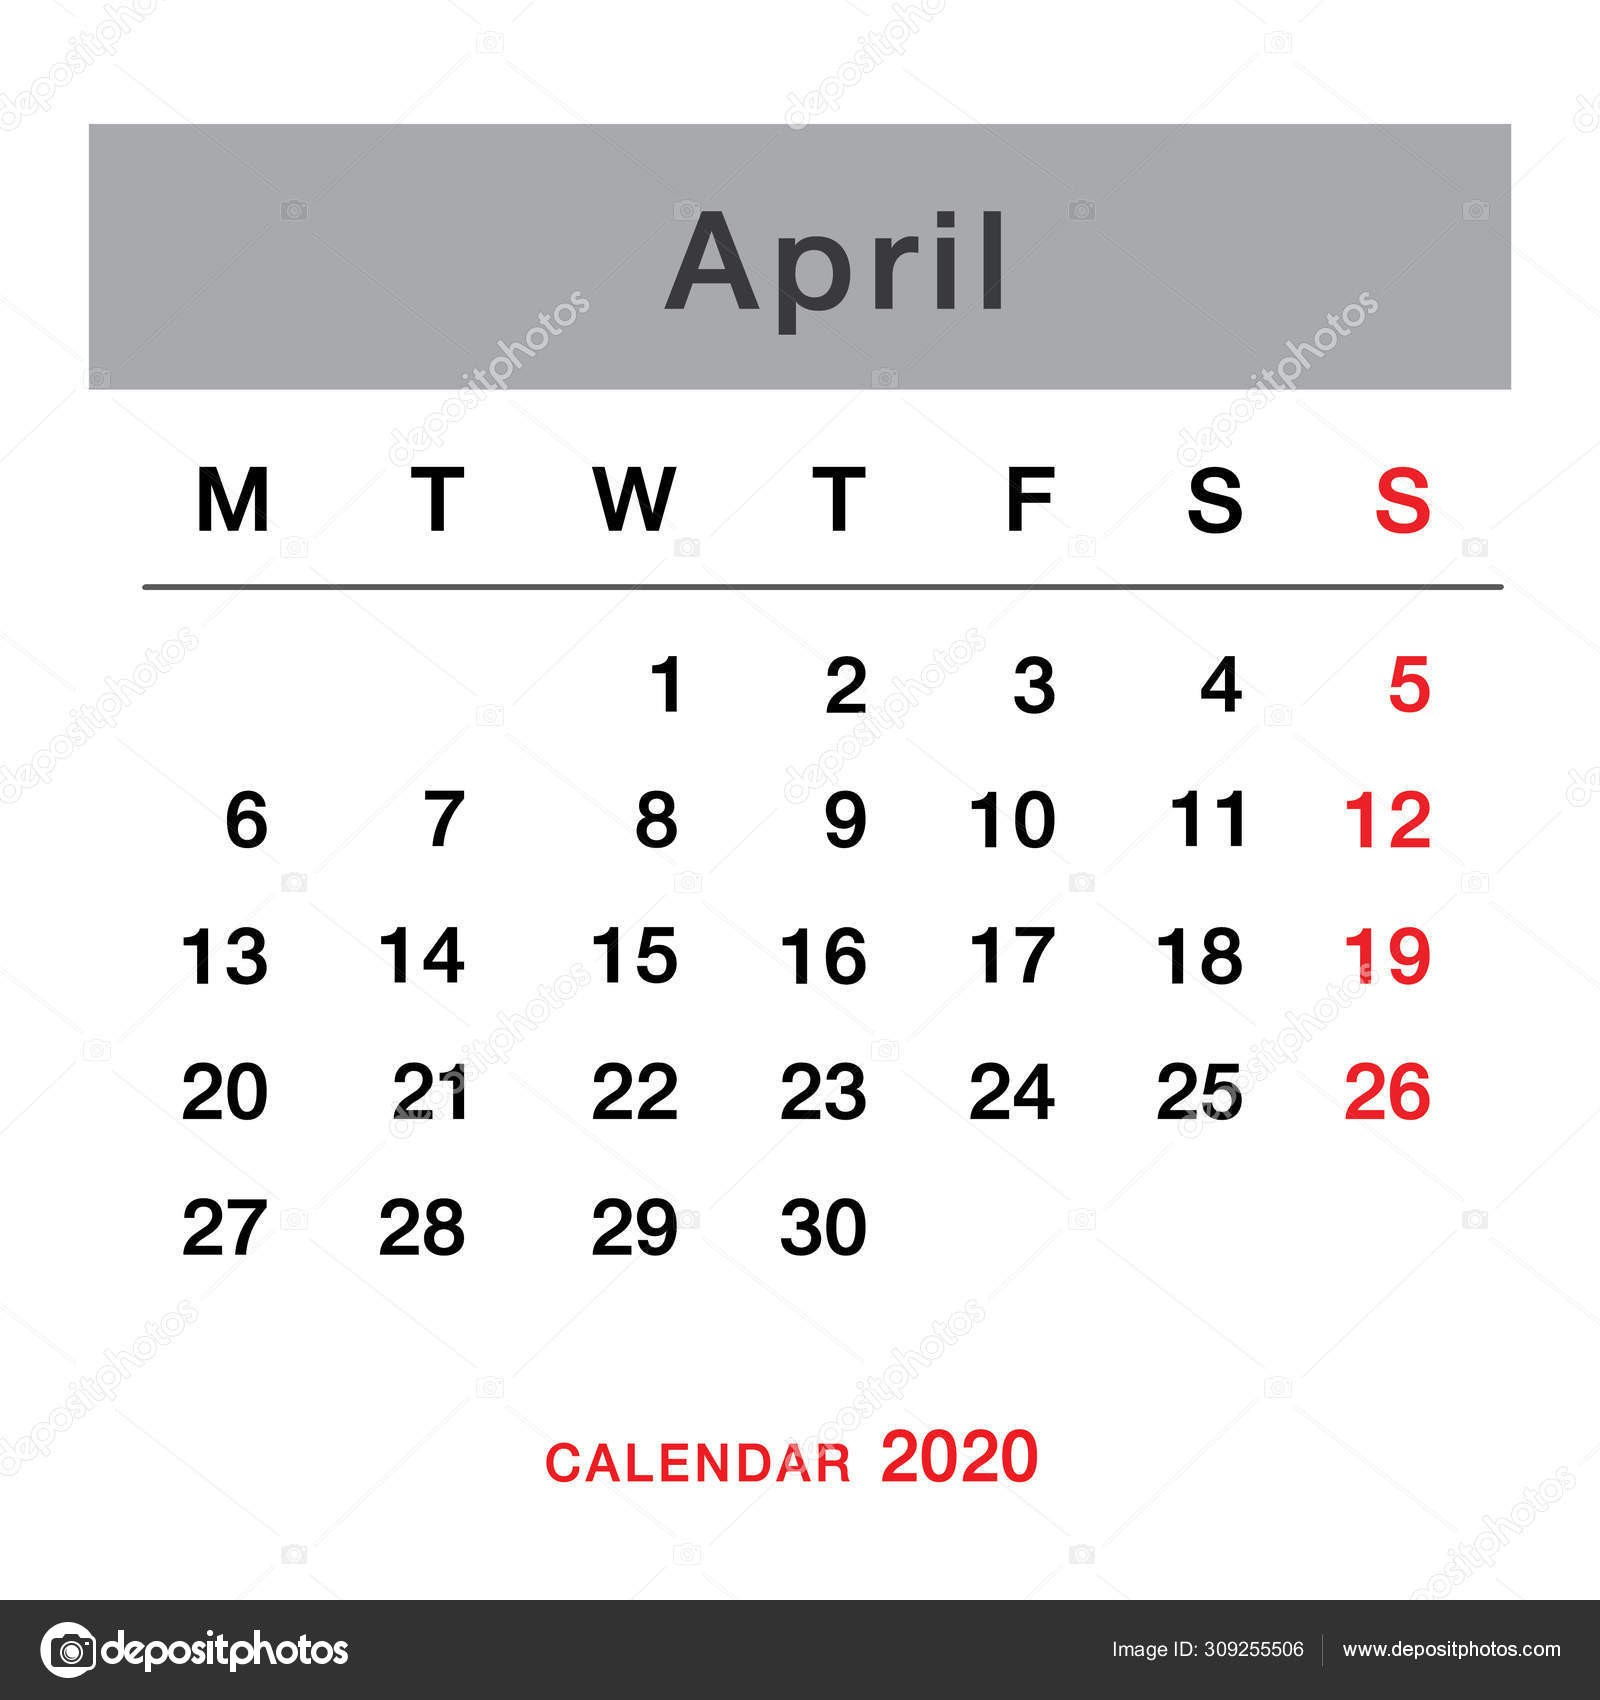 depositphotos stock illustration april 2020 planning calendar simple